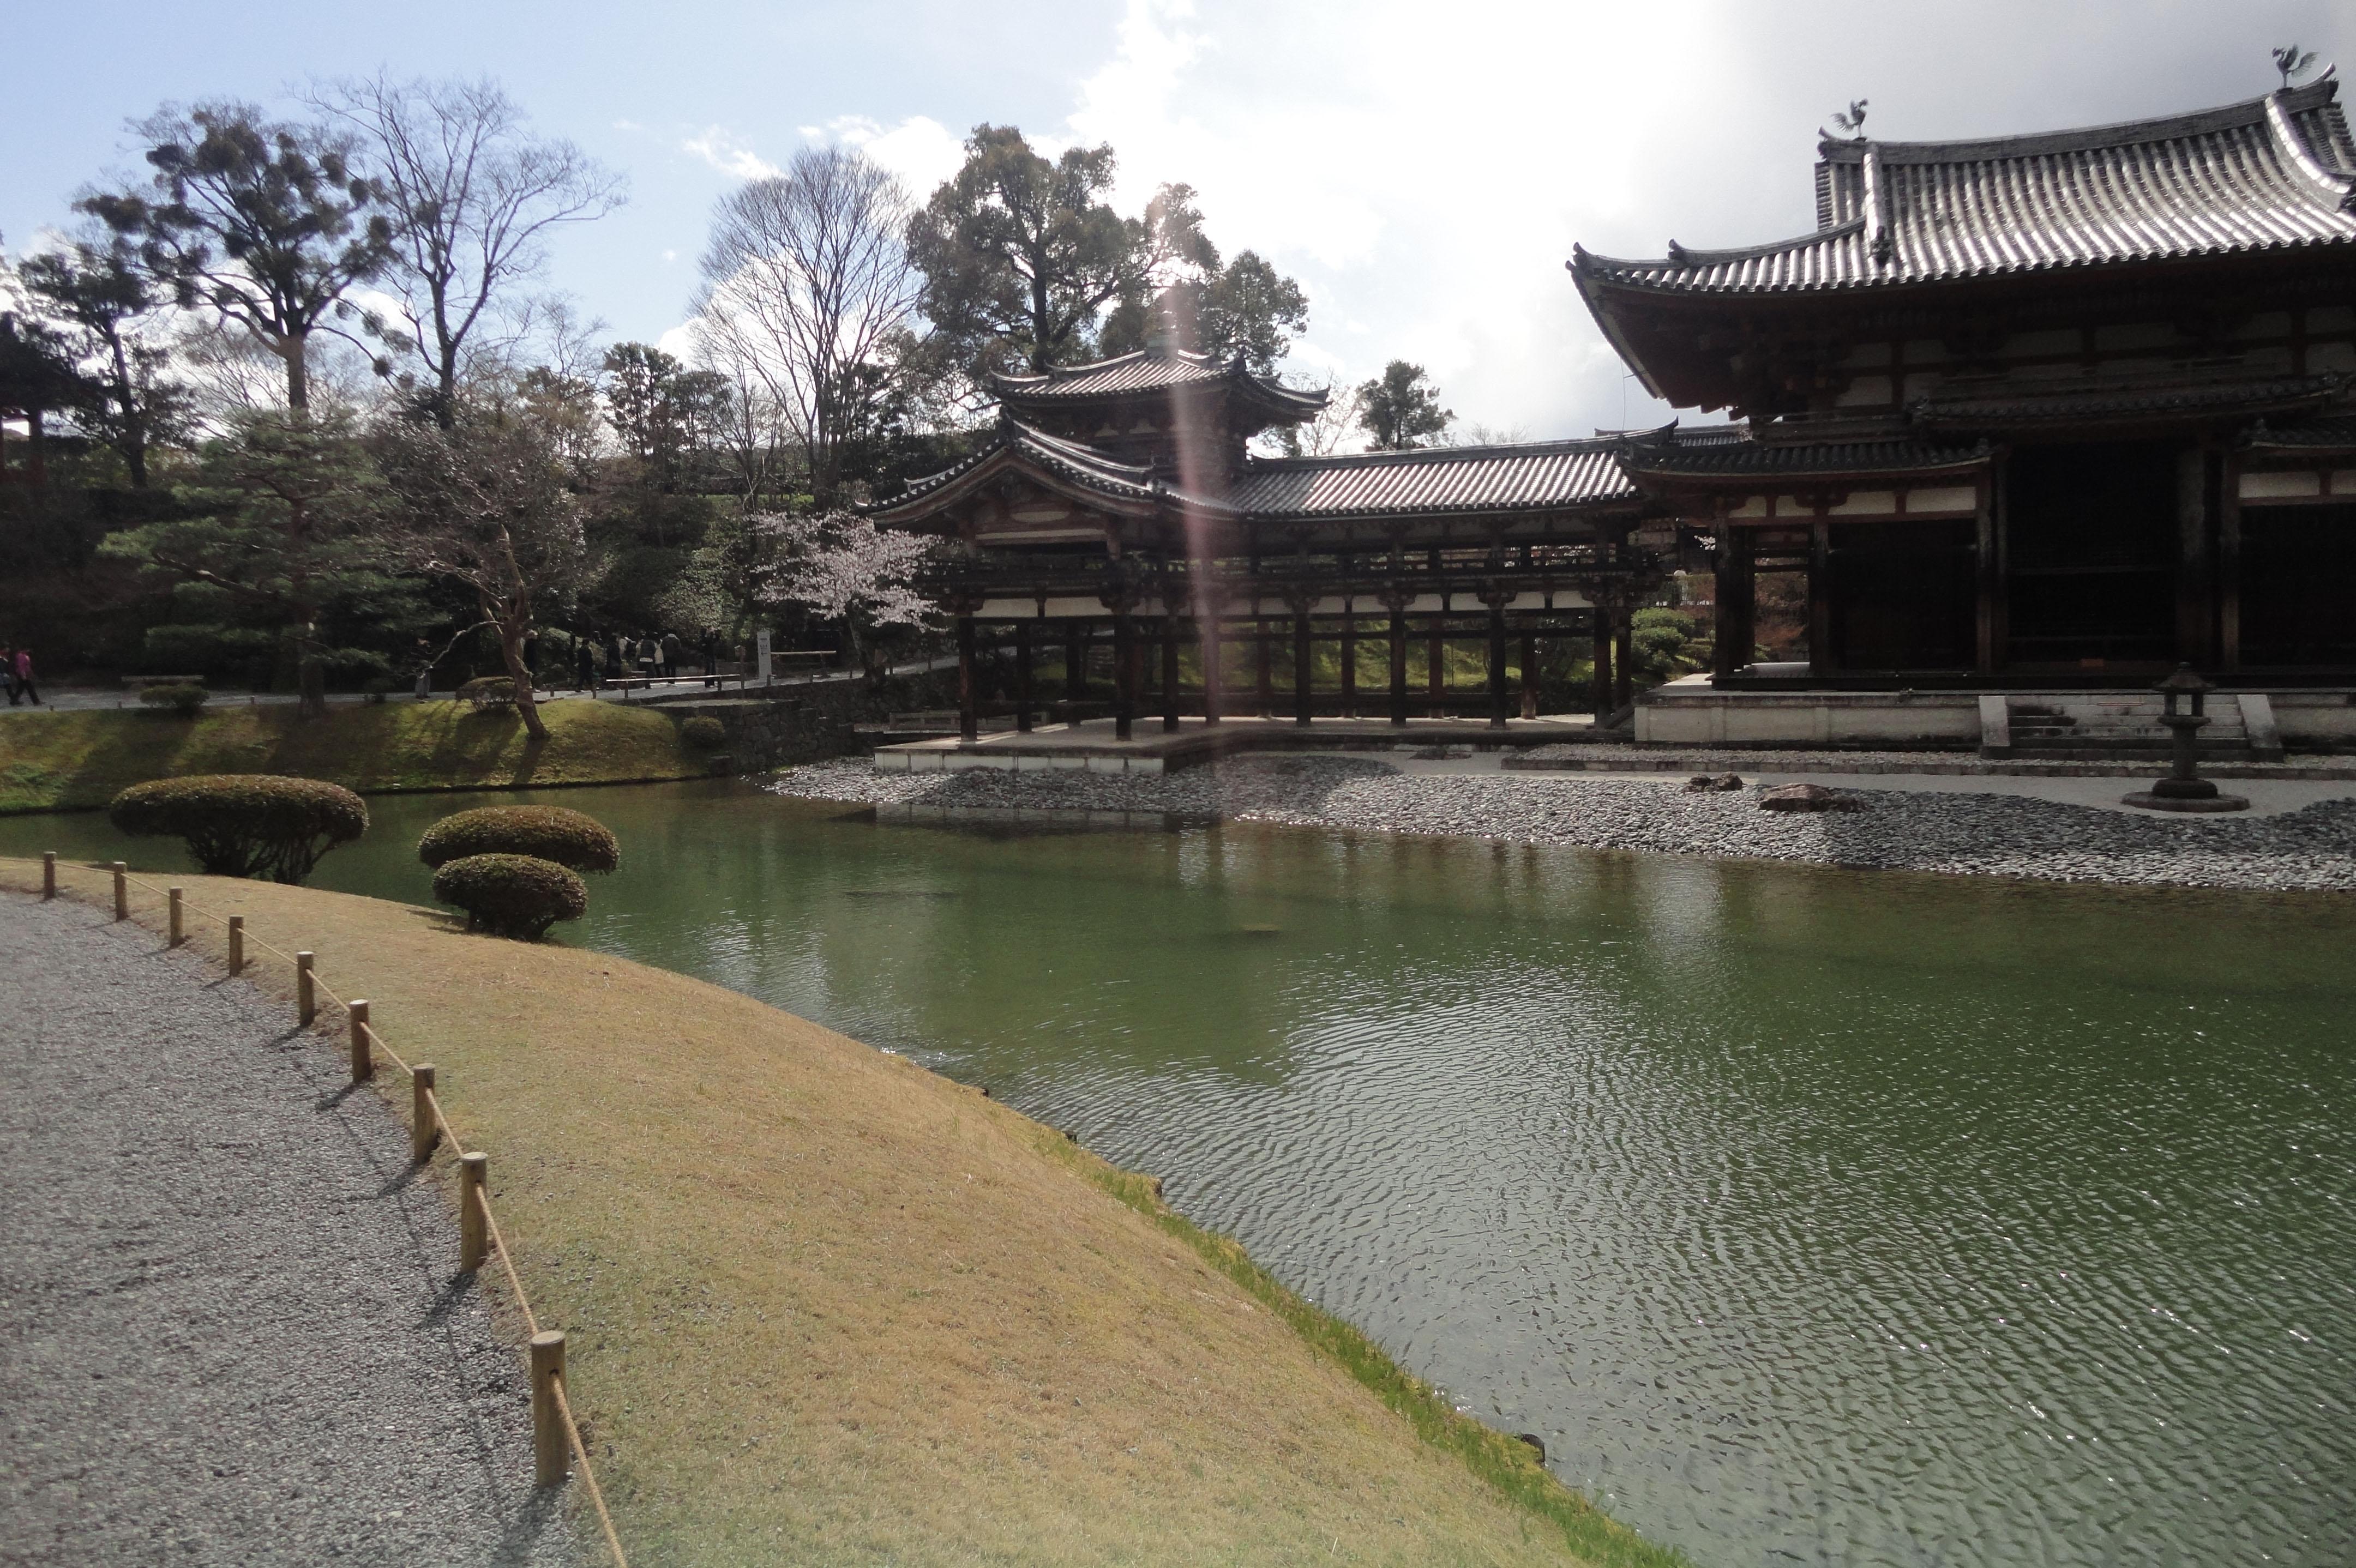 Byodo in temple outer path Phoenix Hall Jodo shiki garden pond Kyoto Japan 01